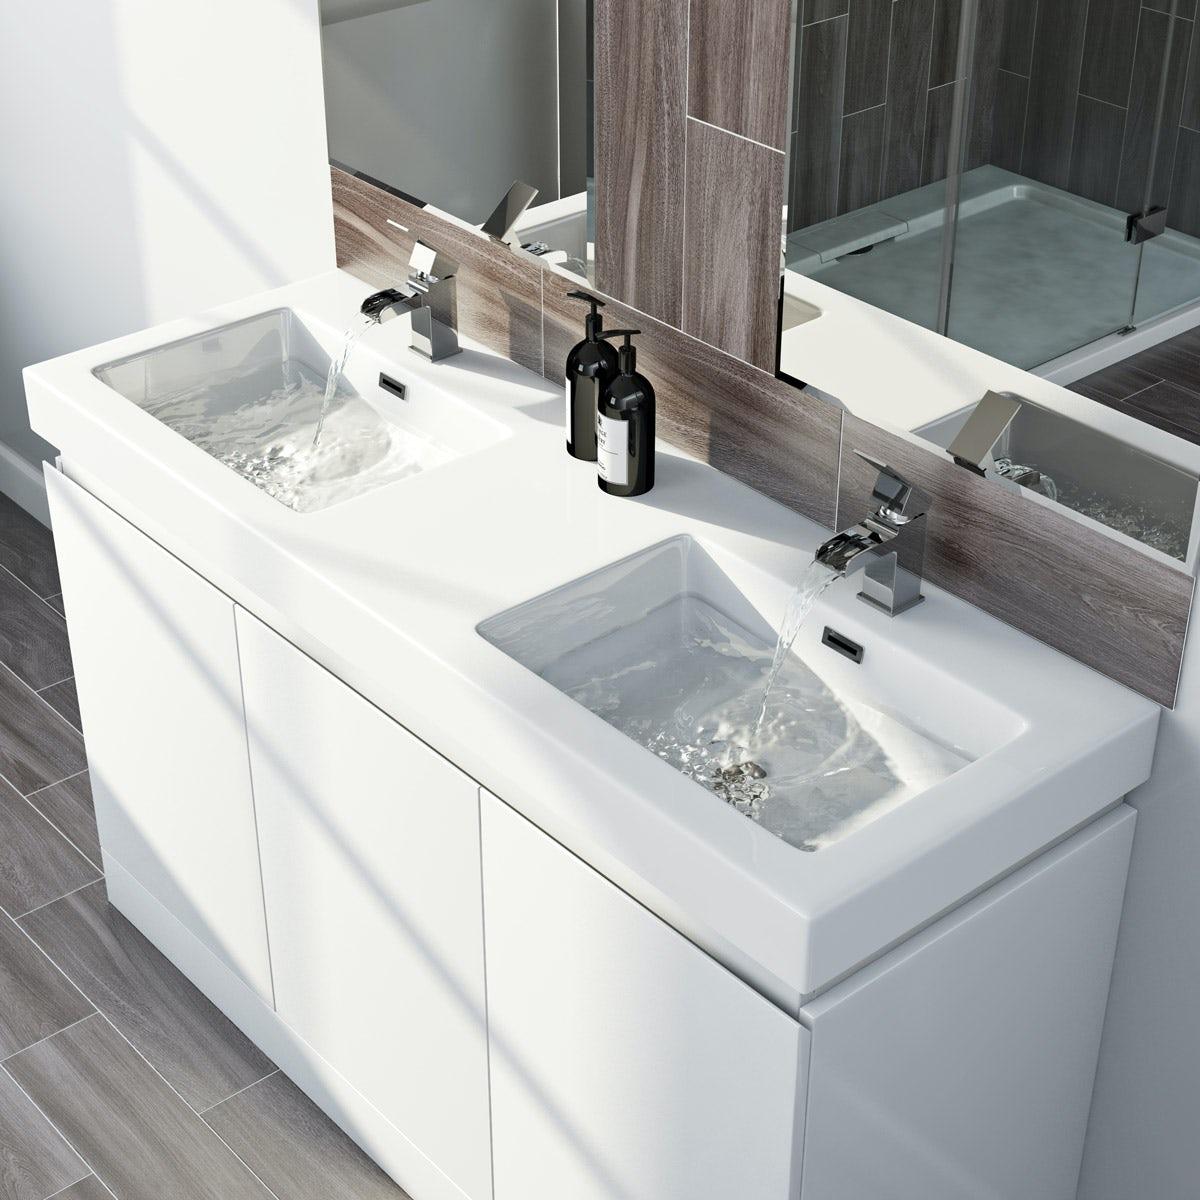 Bathroom Vanity Units Vanity Units with Basins VictoriaPlumcom